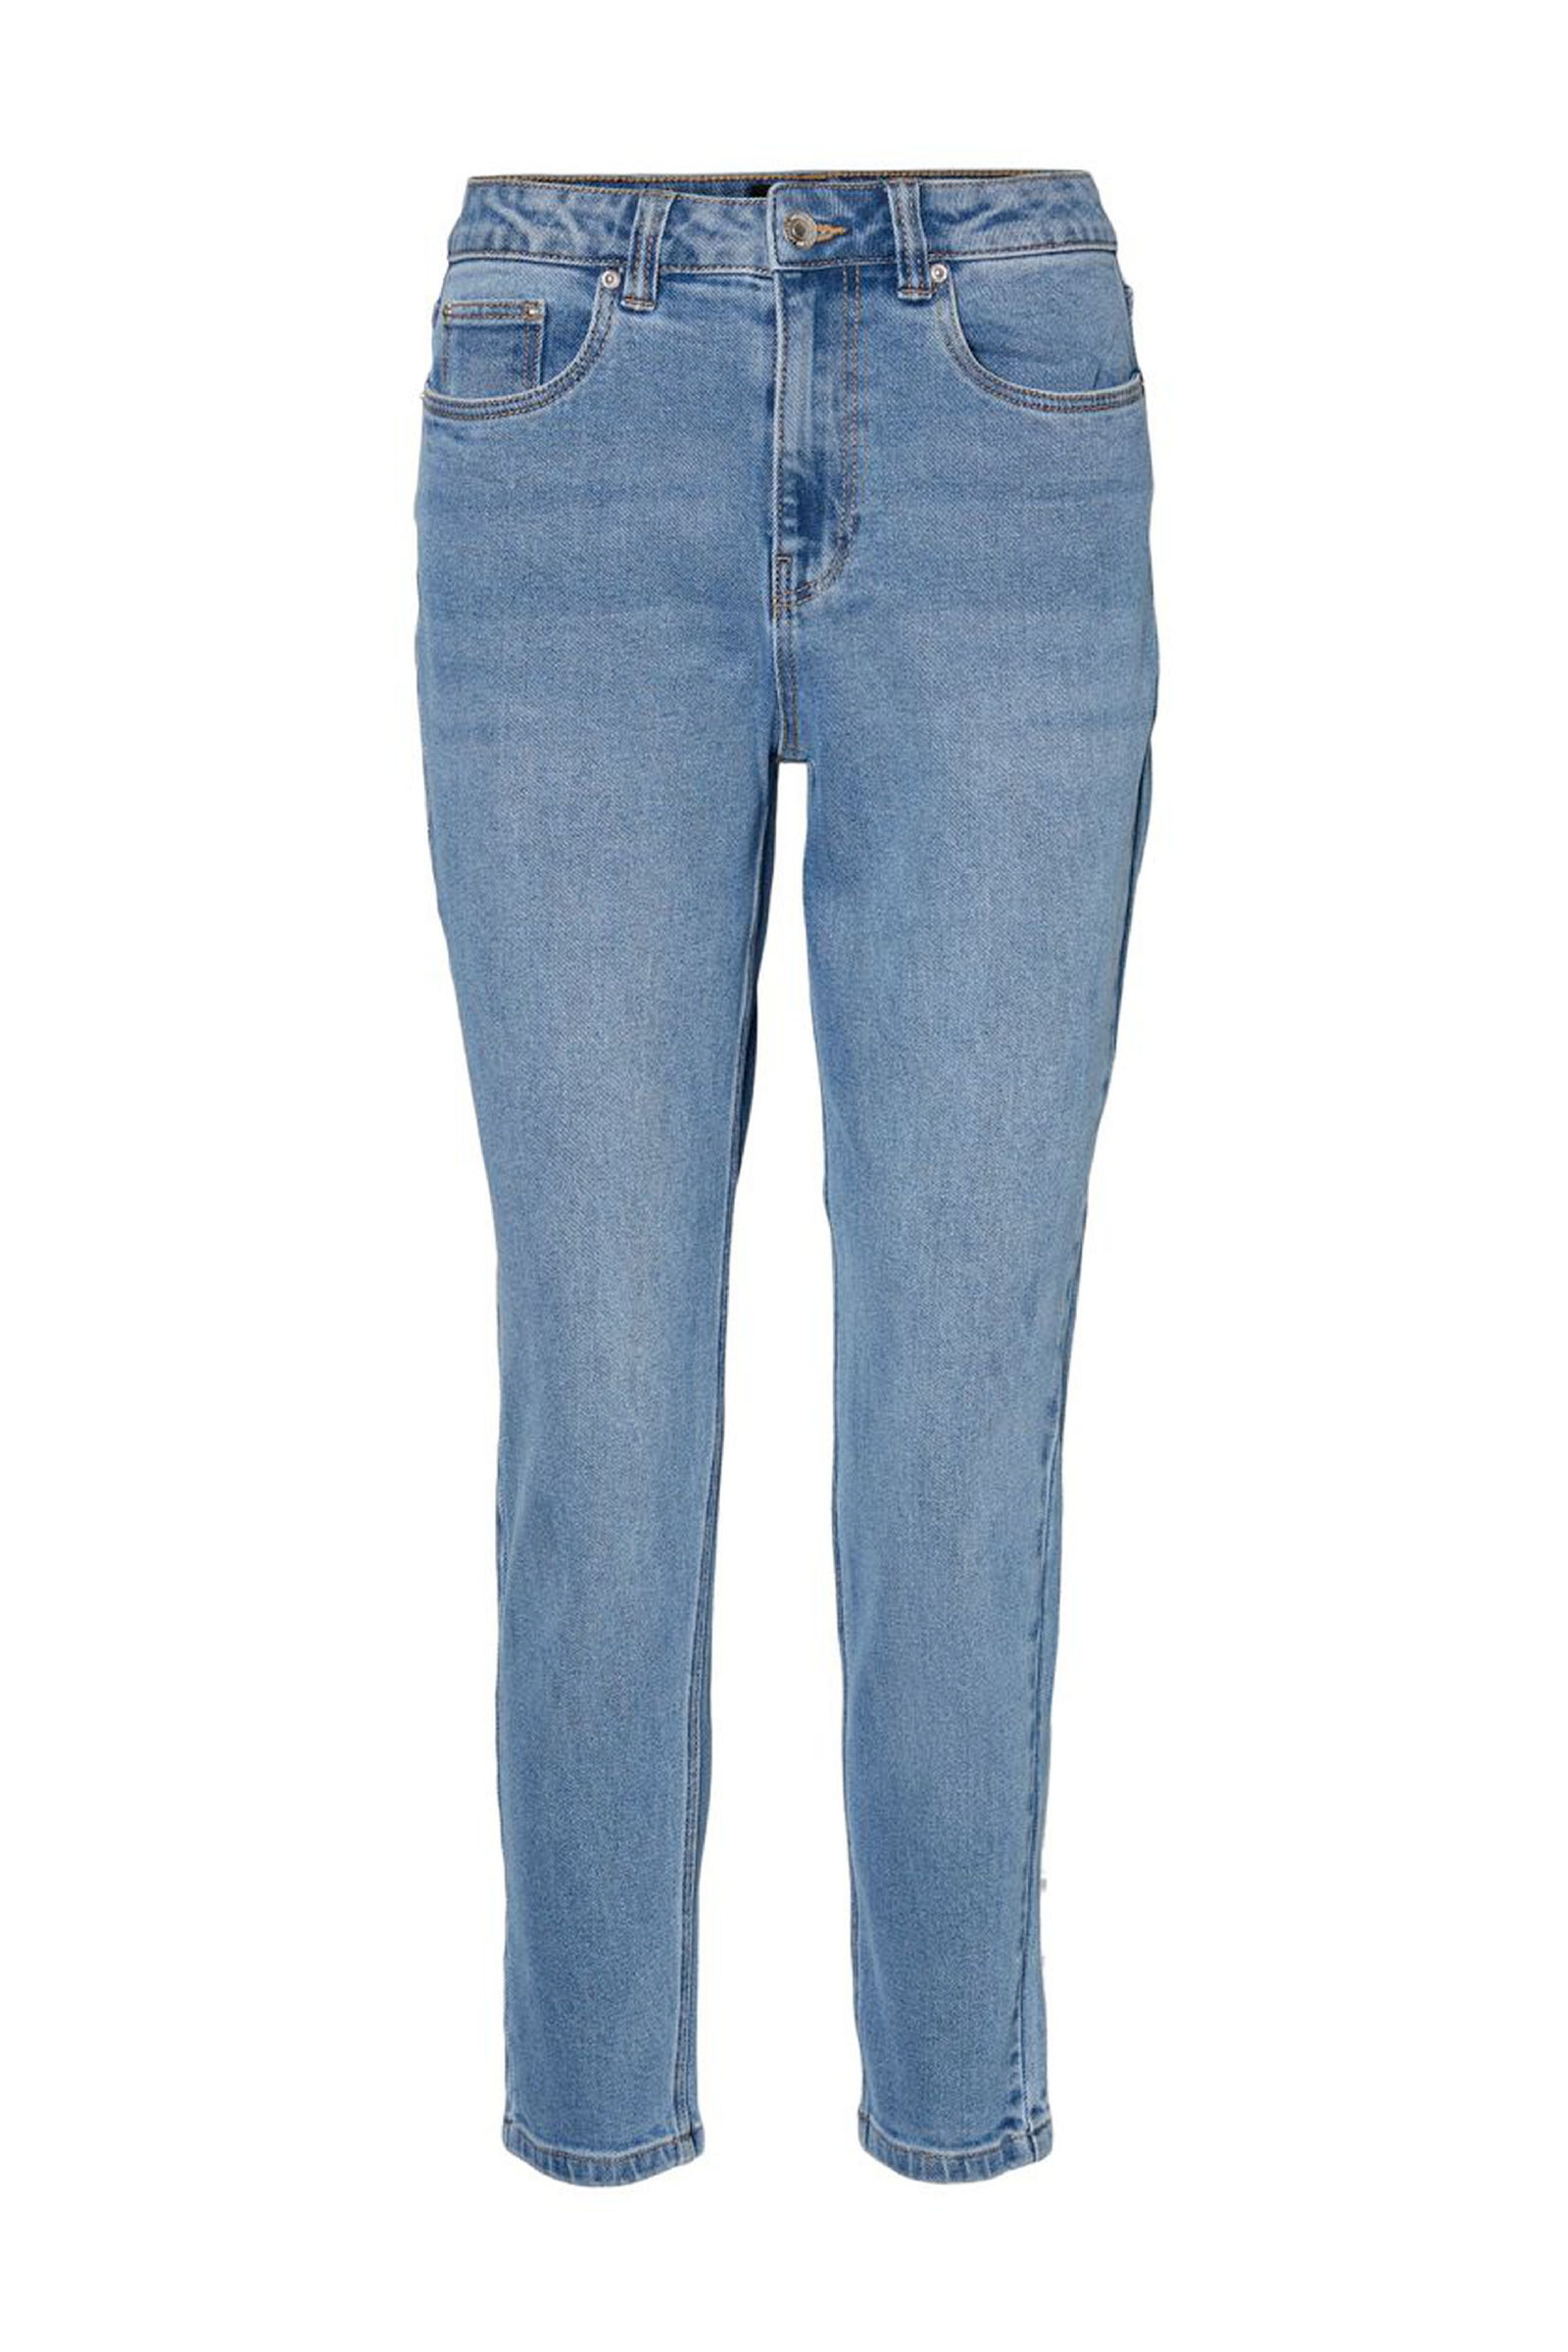 VERO MODA Jeans Woman Blue Denim VERO MODA | Jeans | 10226479Light Blue Denim